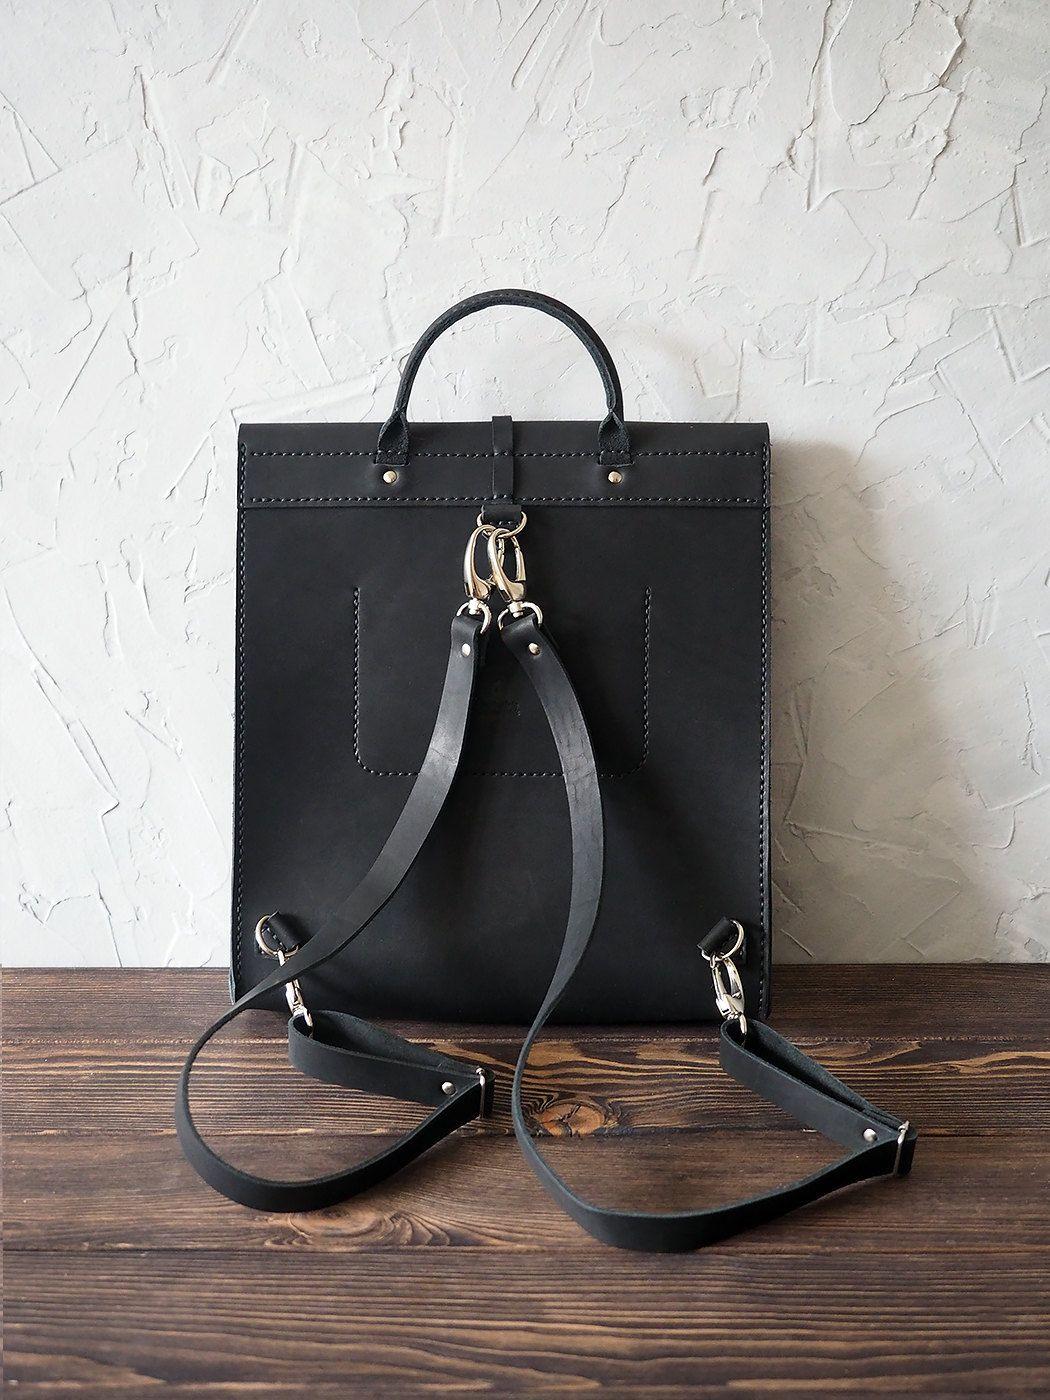 1eebdb131a Women leather backpack. Minimalist bag. Handmade genuine leather rucksack.  Black color. Cut